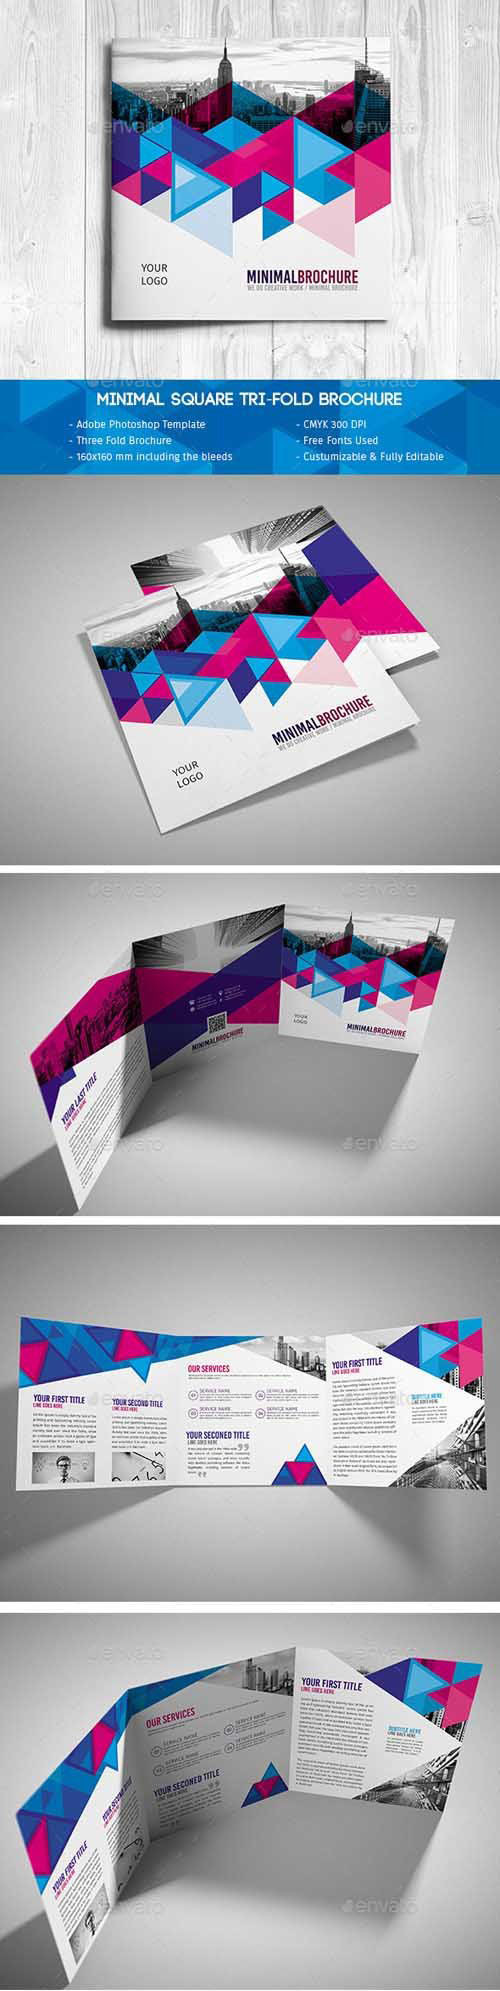 Minimal Square Tri Fold Brochure Psd Template Free Download